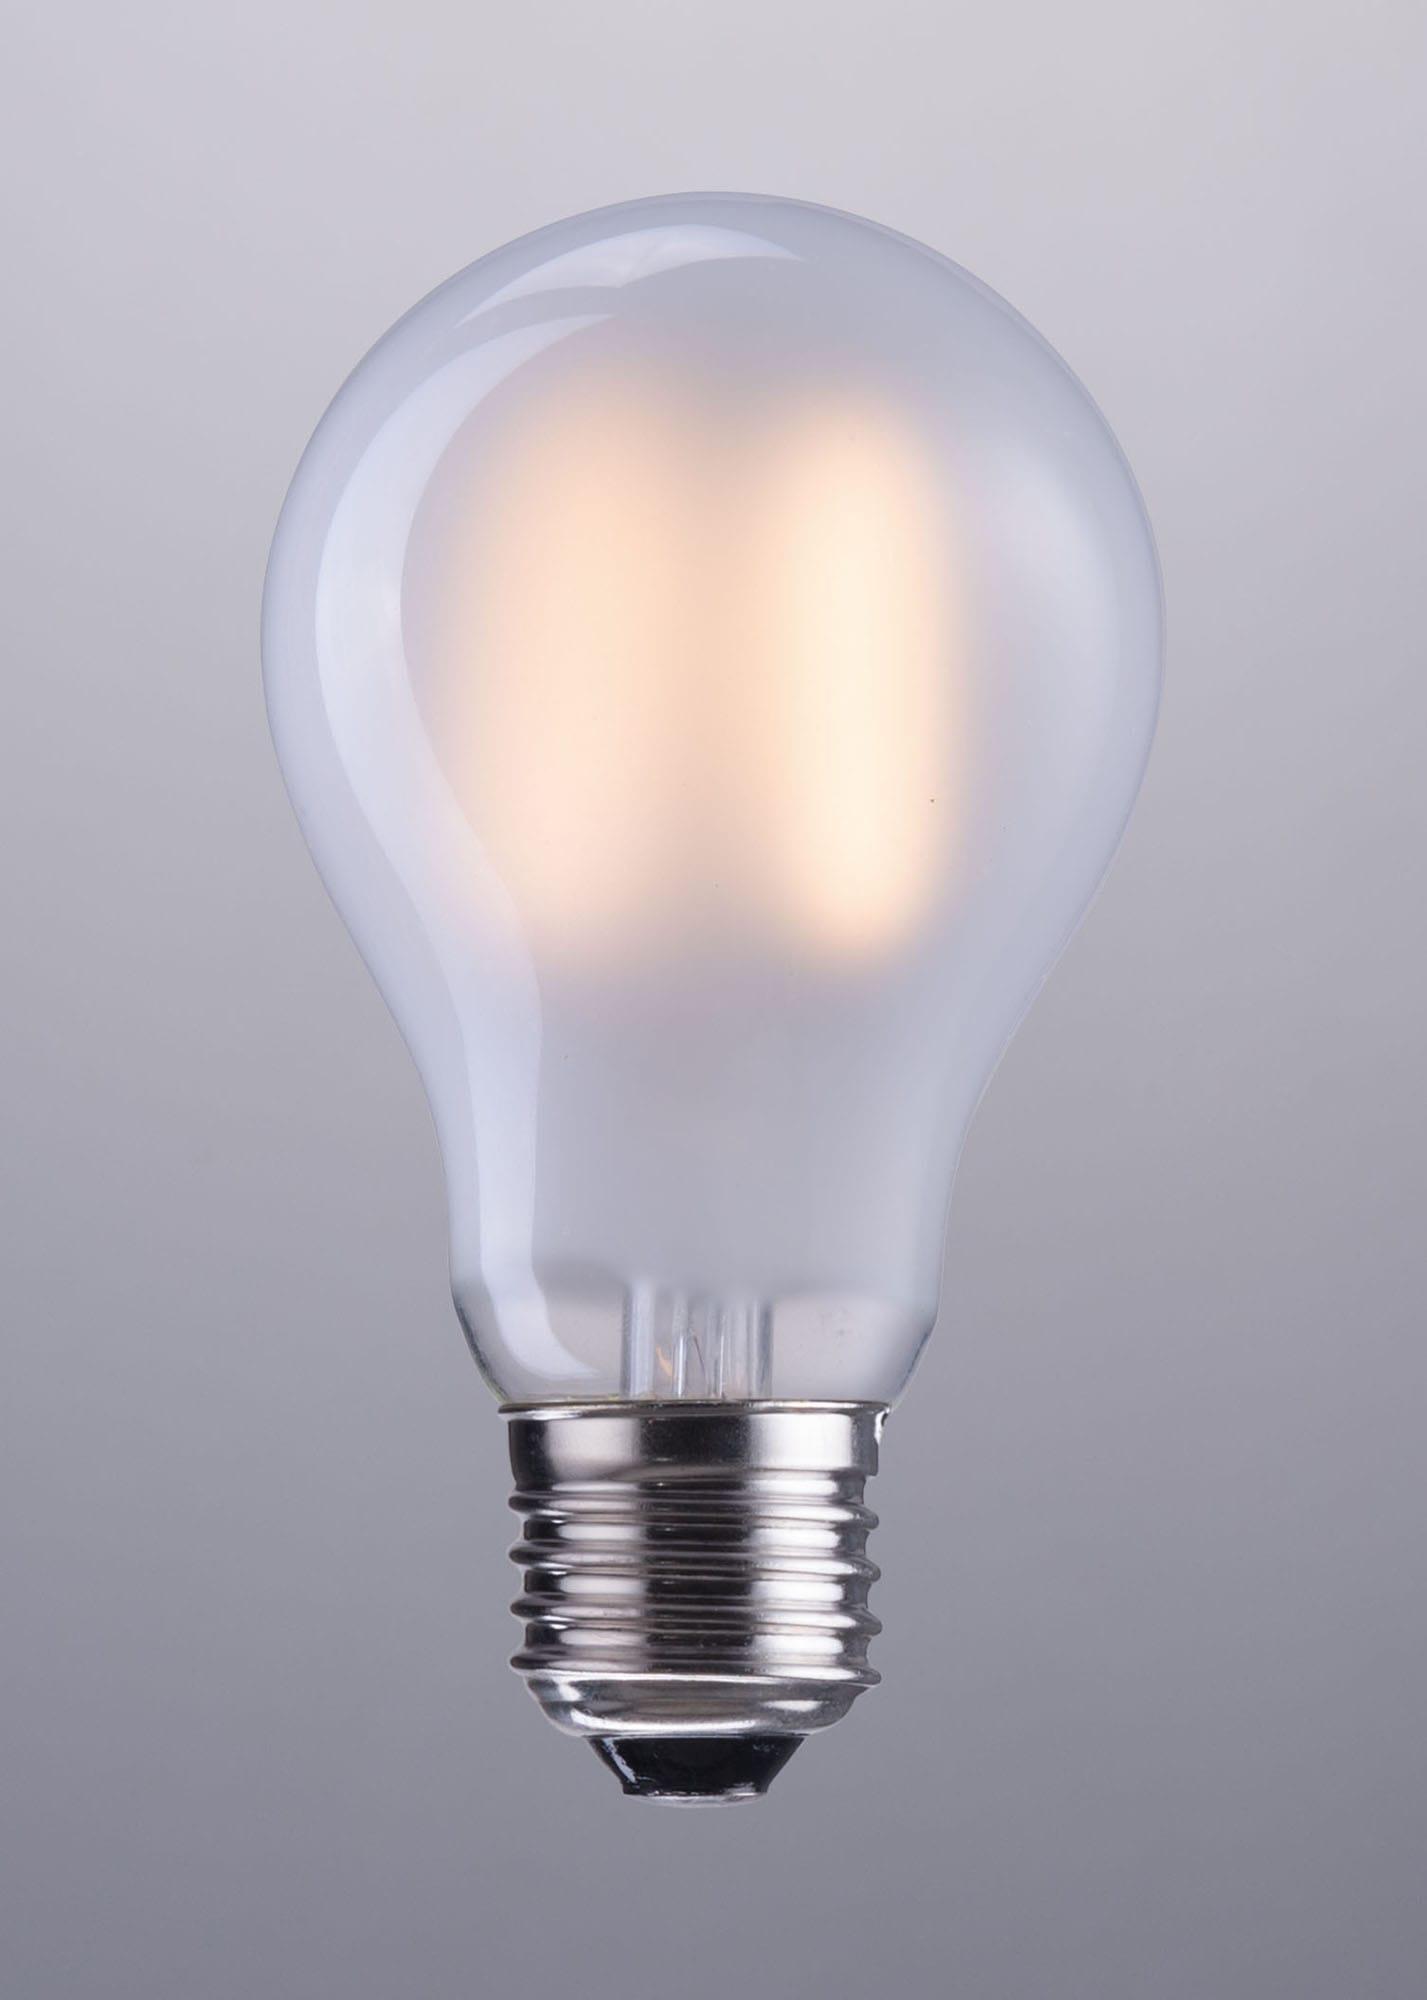 E26 A19 2w Led 100x60mm F White Light Bulb By Zuo Modern